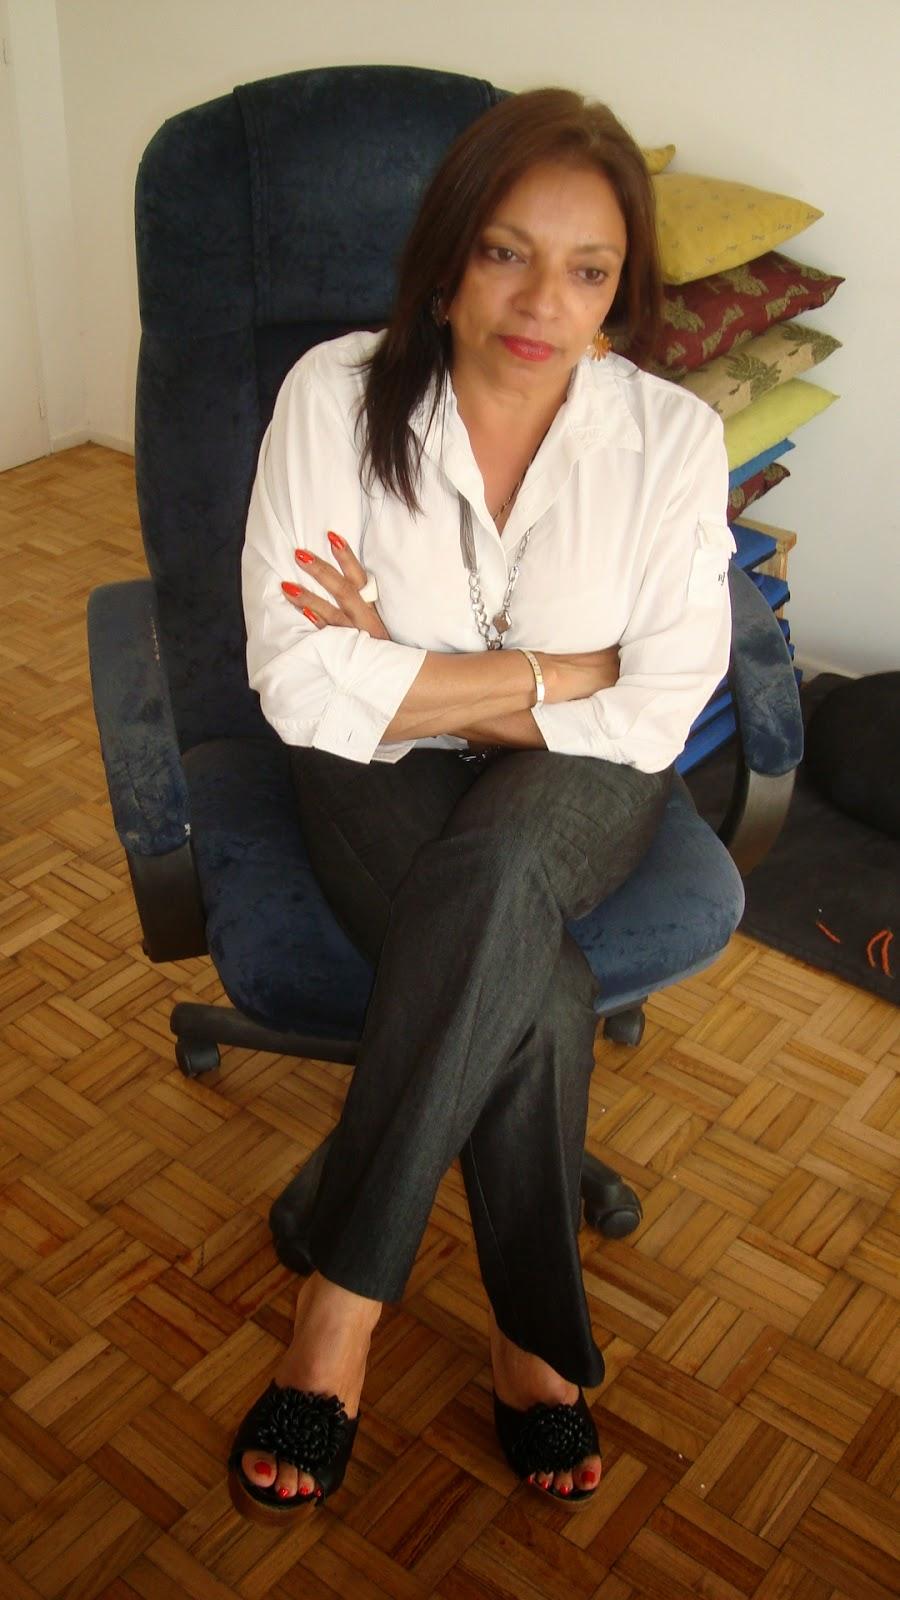 comunicacion no verbal, actitud, Psicologia, Aida Bello Canto,